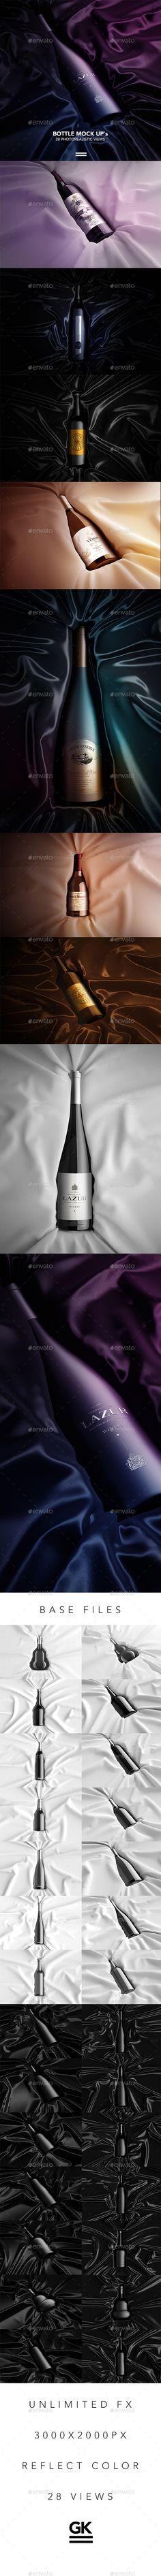 Wine Bottle Mock-up by Gk1 3D Underground / Subway Mock-up / Animated Edition 7 types of bottles